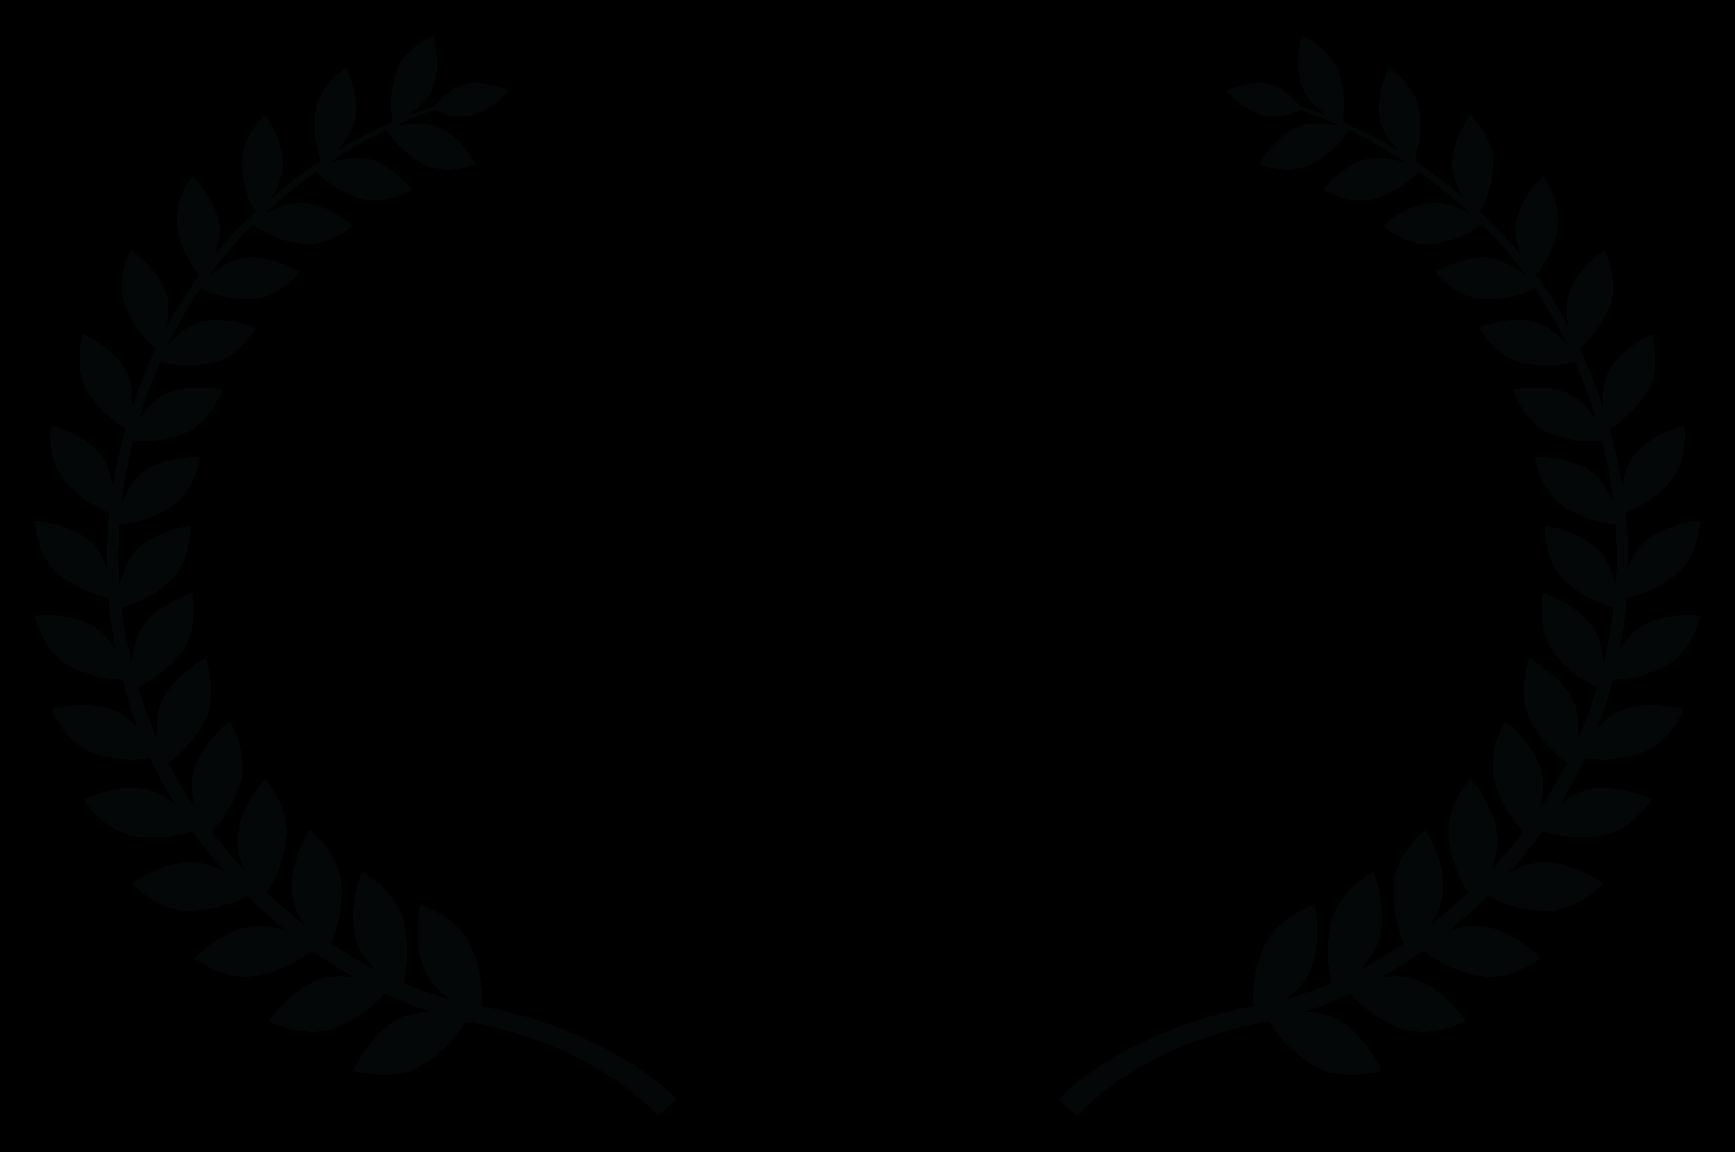 OFFICIAL SELECTION - Fastnet Film Festival - 2018